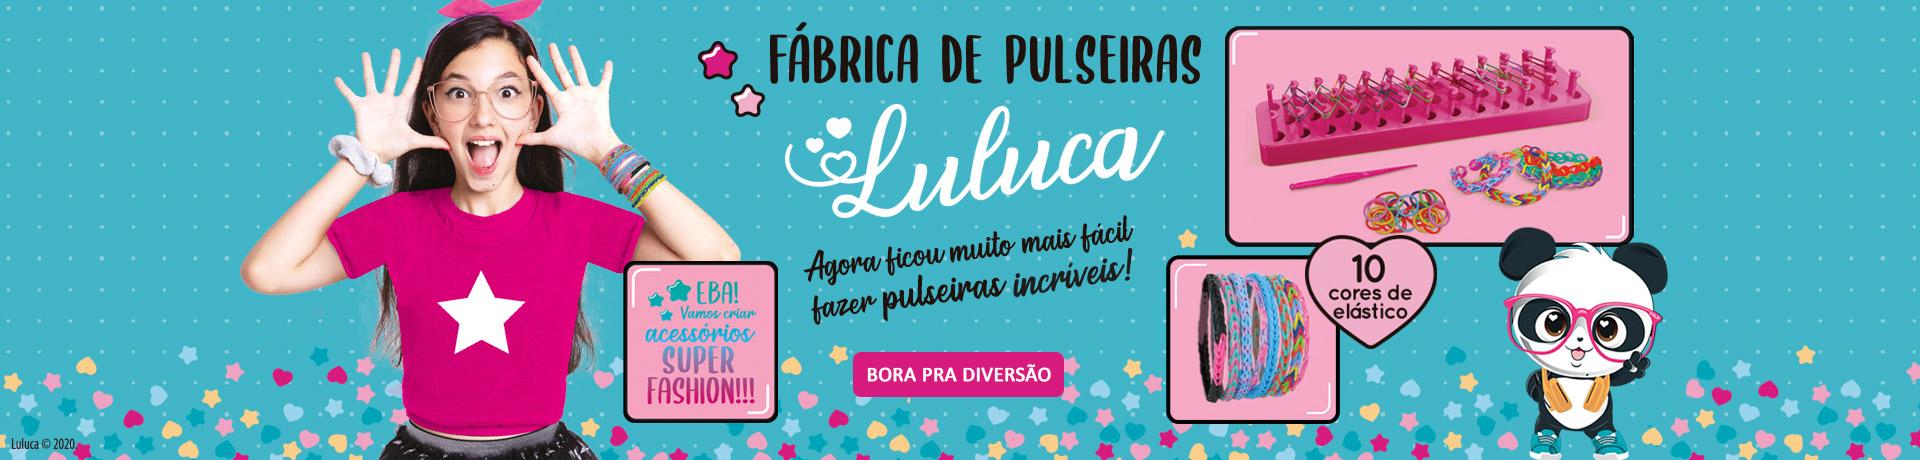 Fábrica de Pulseiras da Luluca